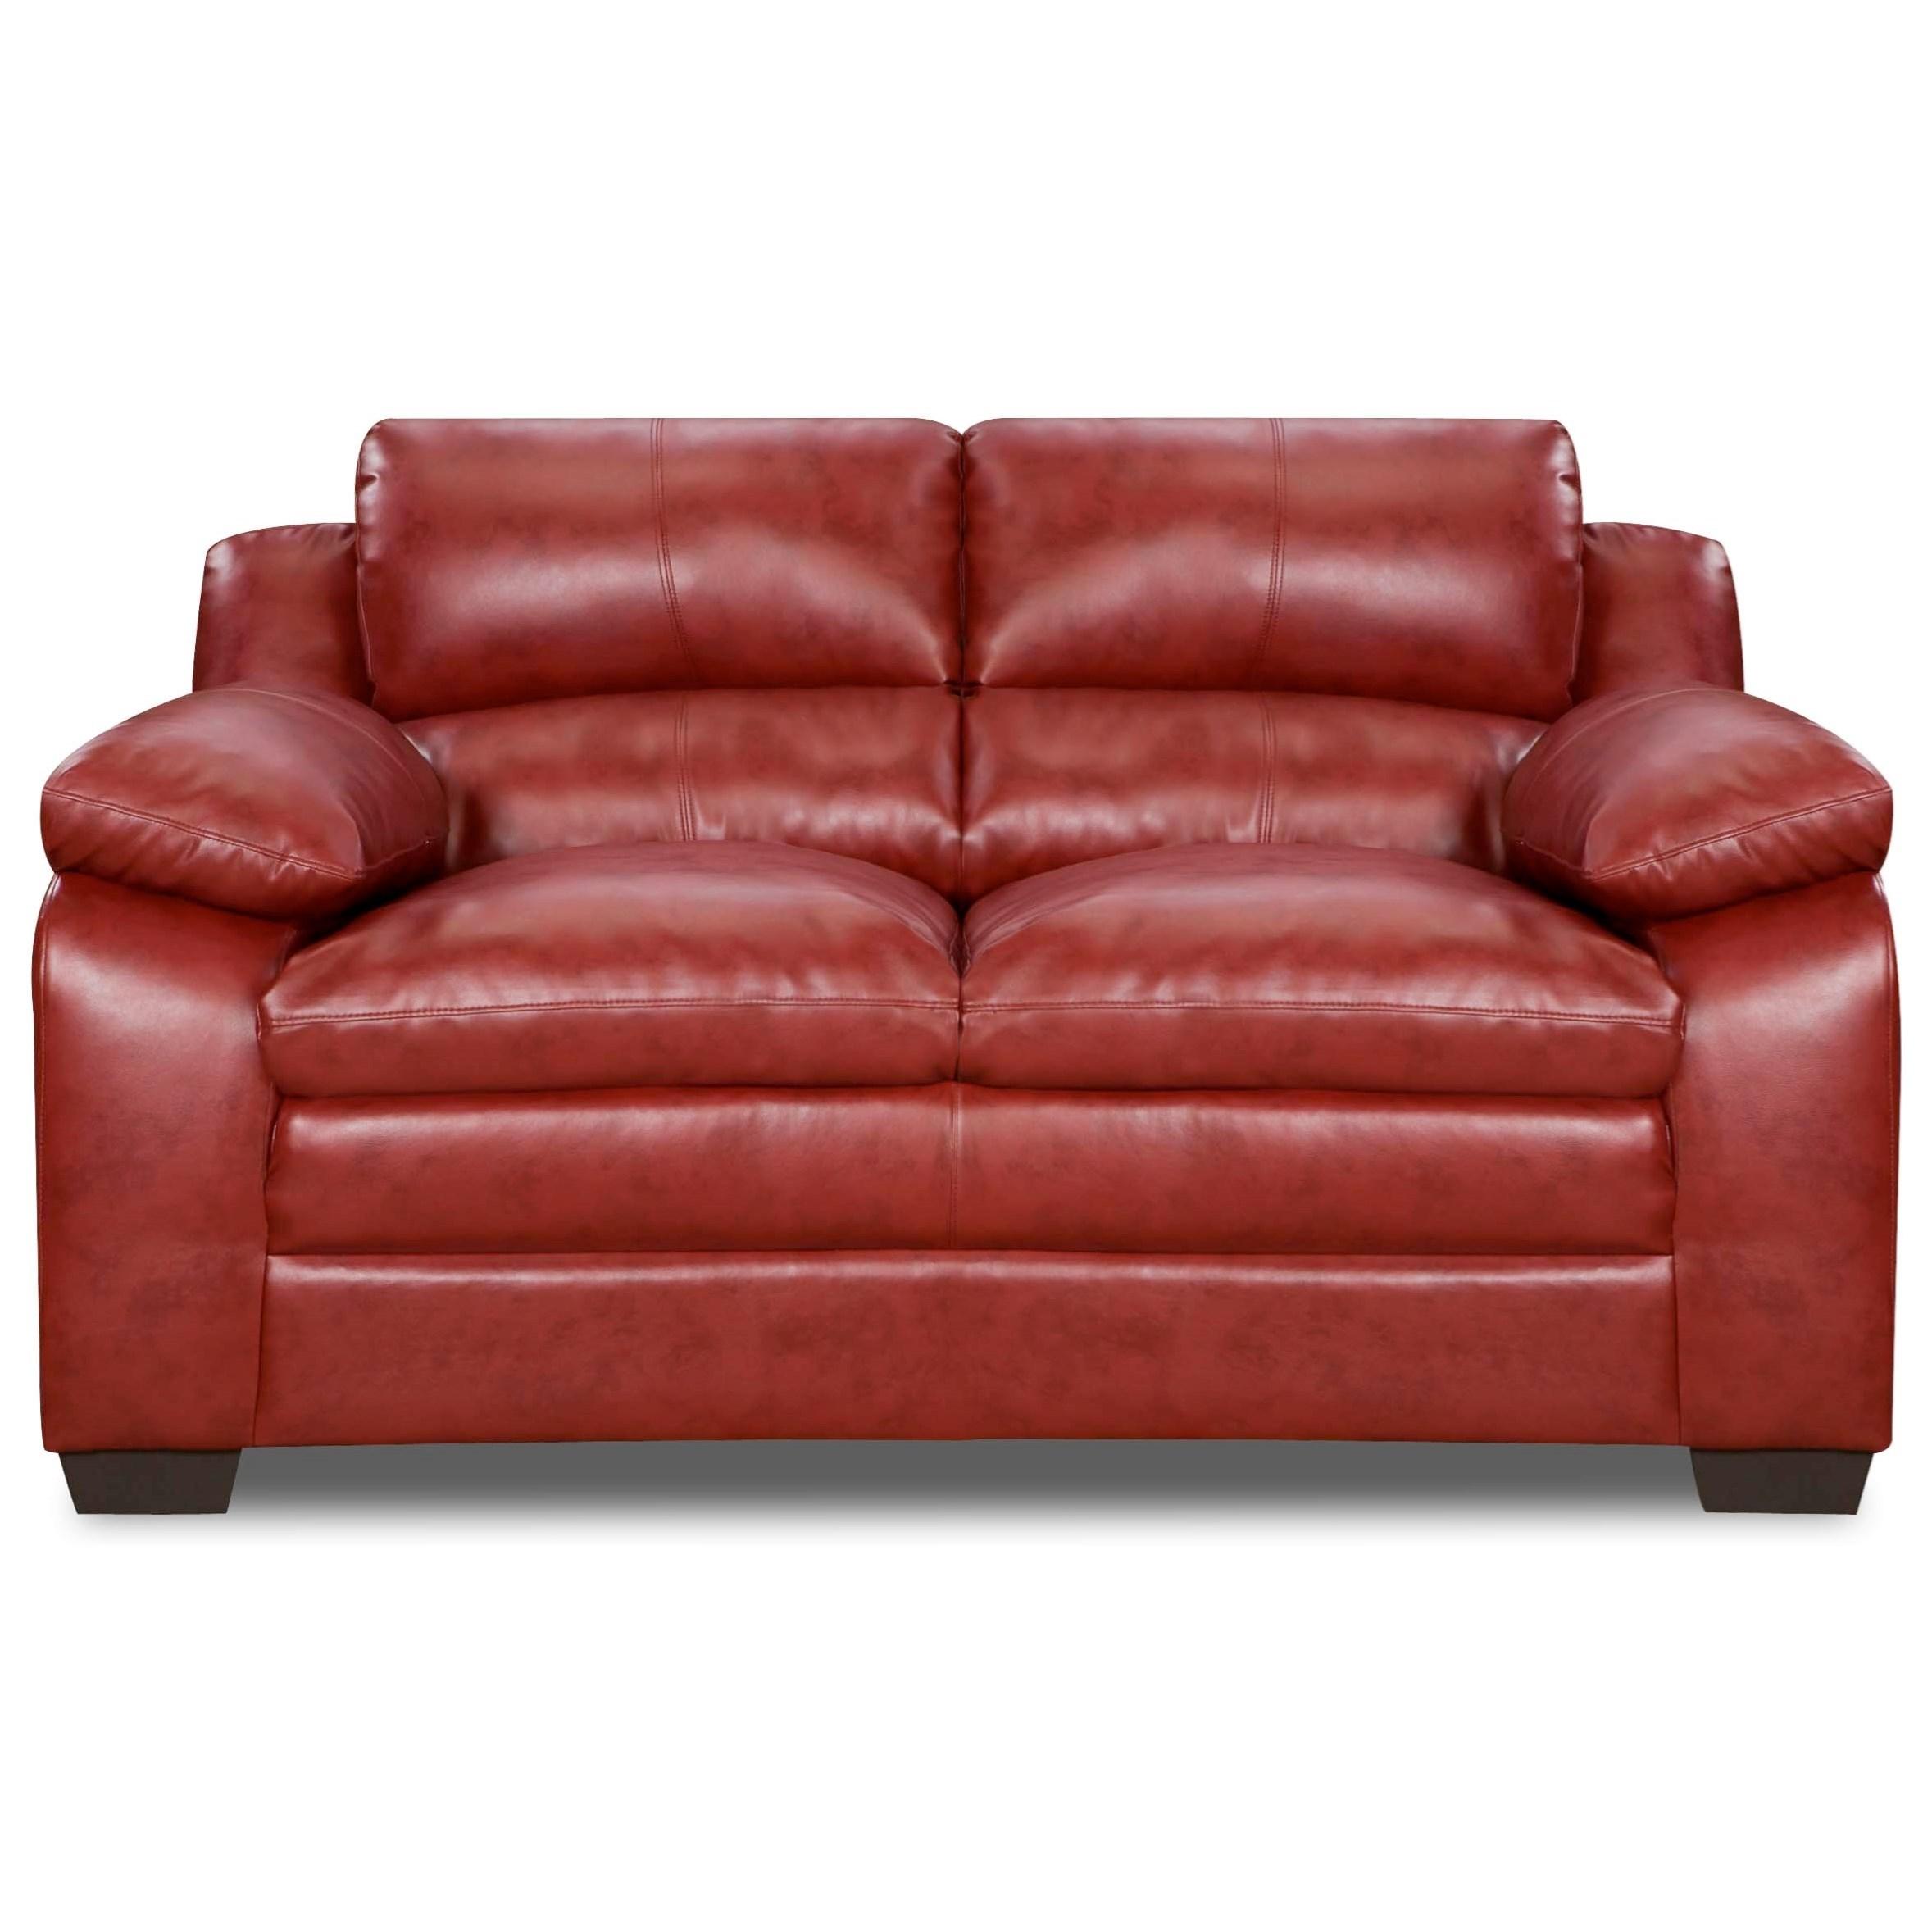 United Furniture Industries 5066 Loveseat - Item Number: 5066Loveseat-SohoCardinal